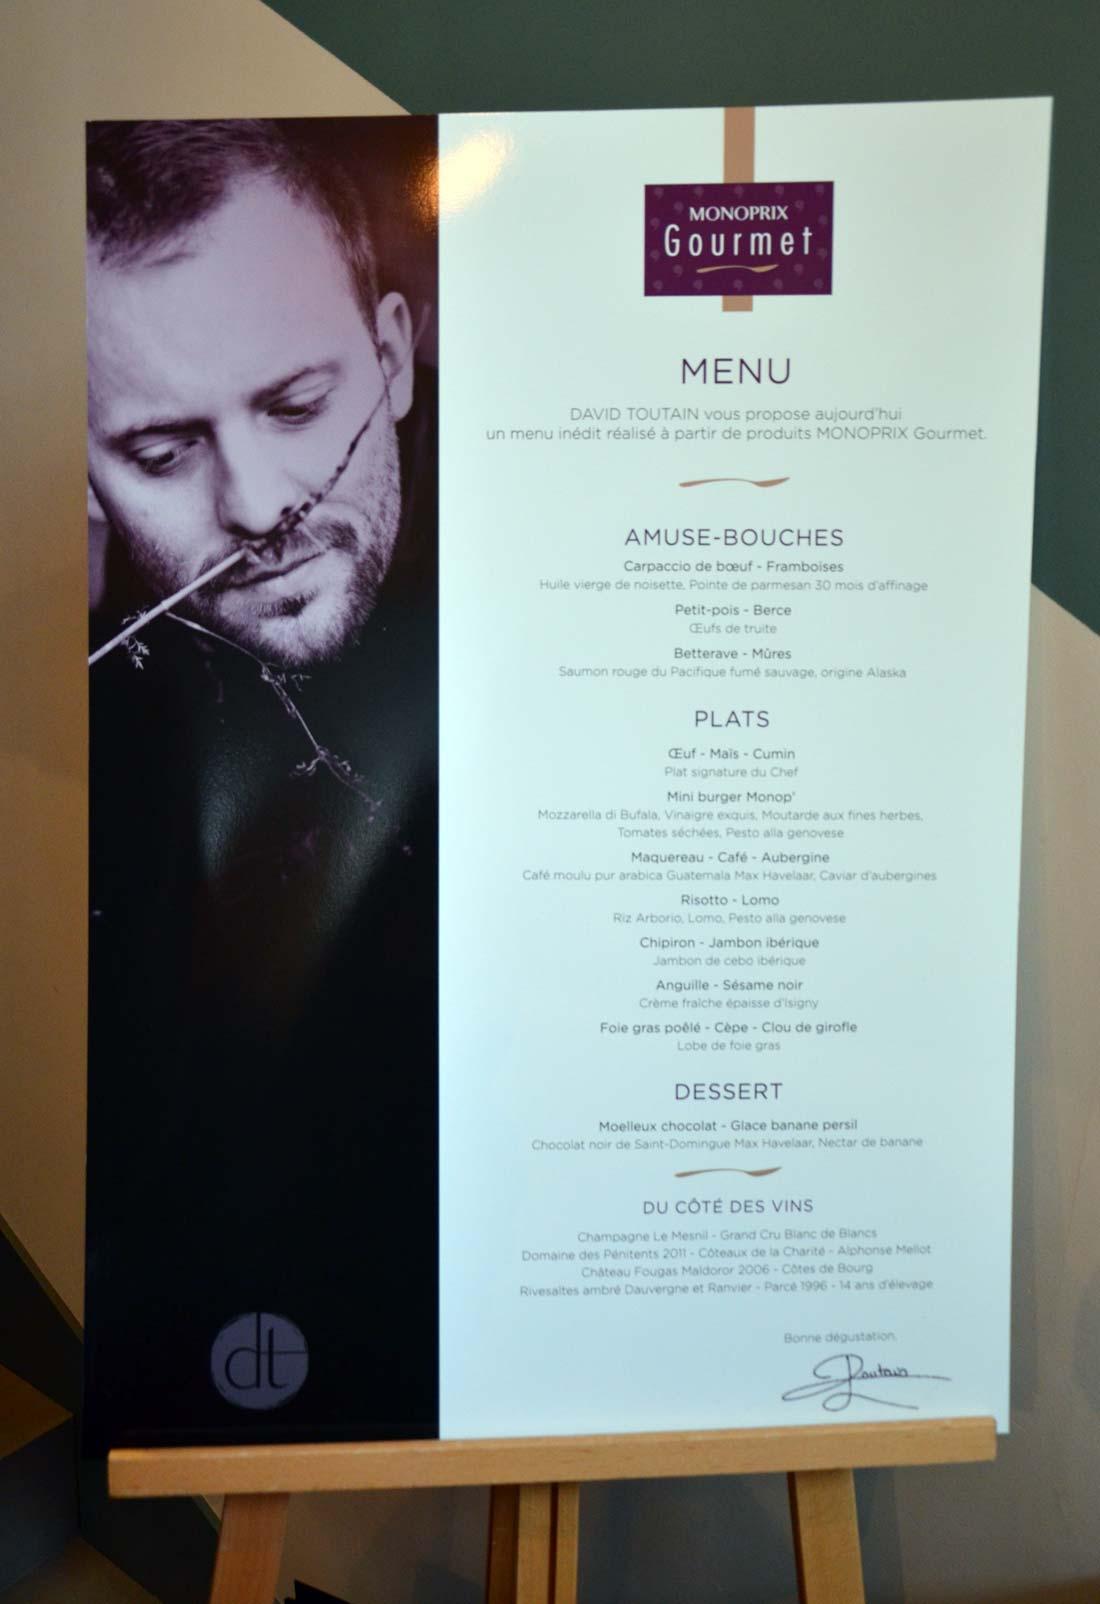 menu David Toutain pour Monoprix Gourmet